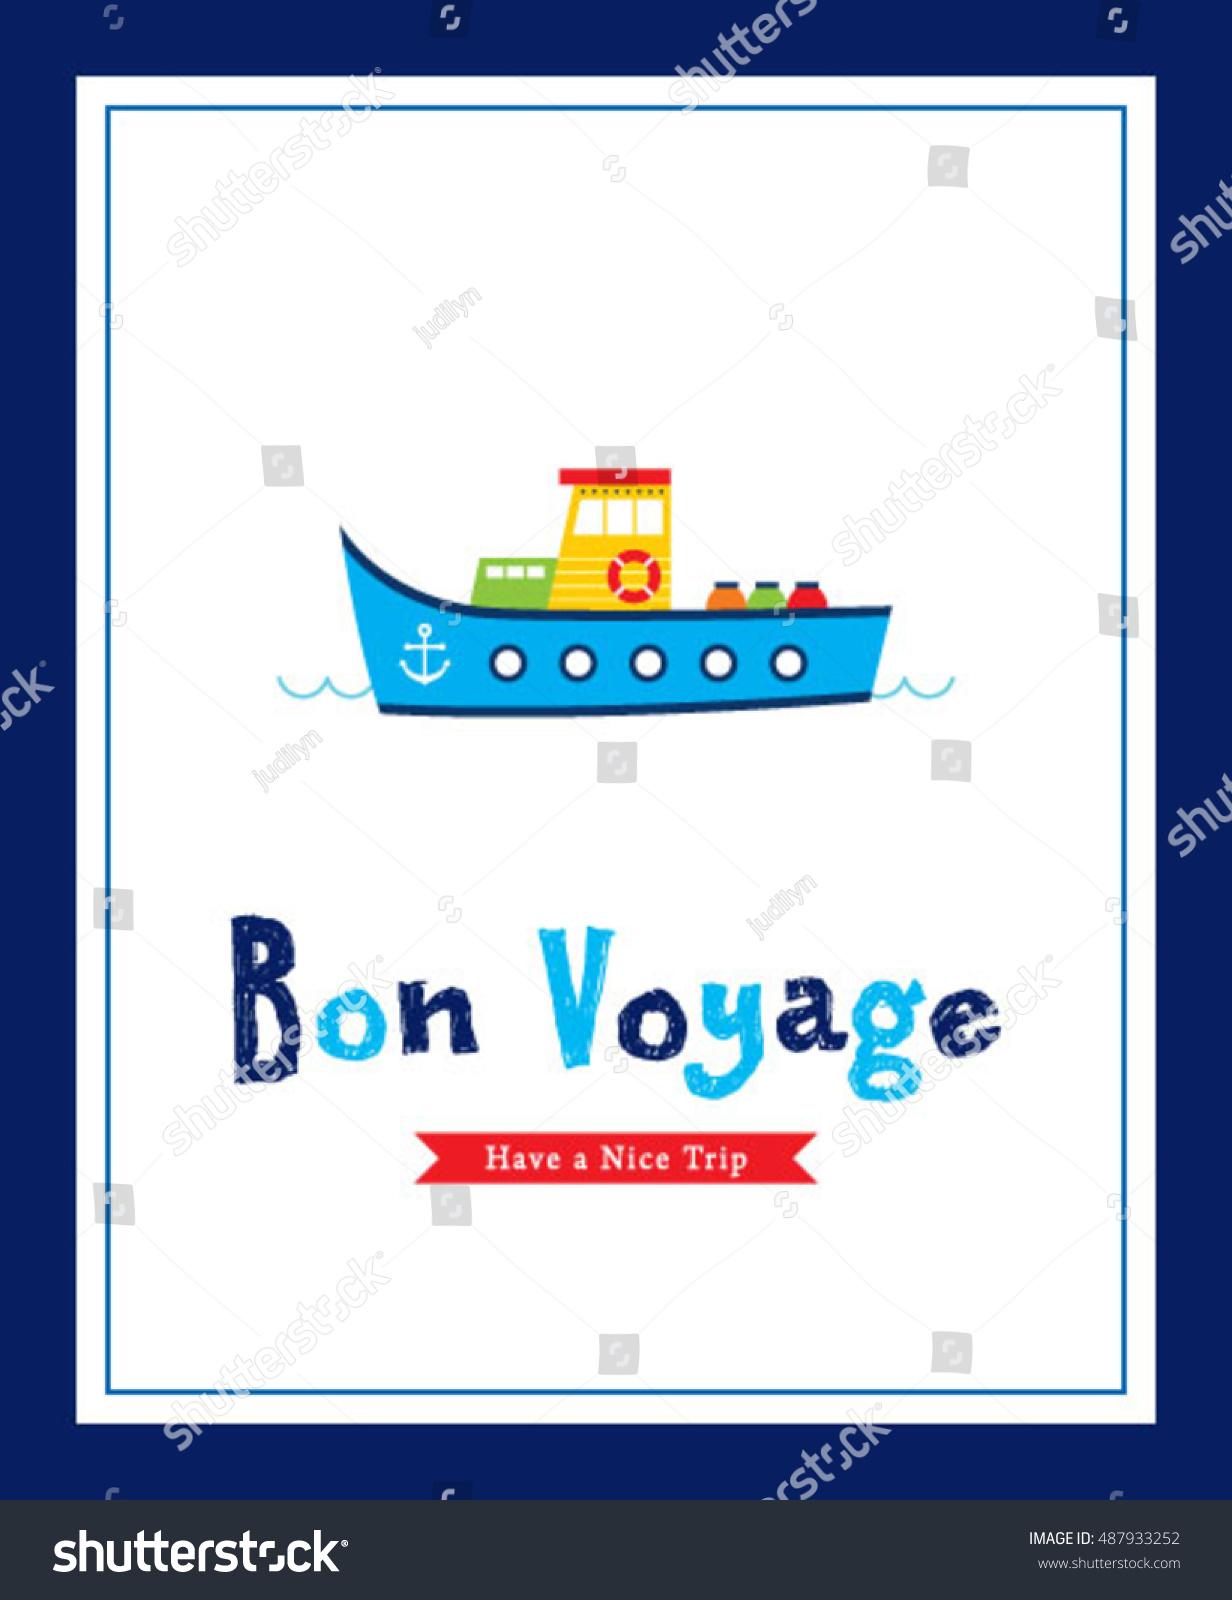 Cute ship bon voyage greeting card stock vector 487933252 shutterstock cute ship bon voyage greeting card kristyandbryce Image collections